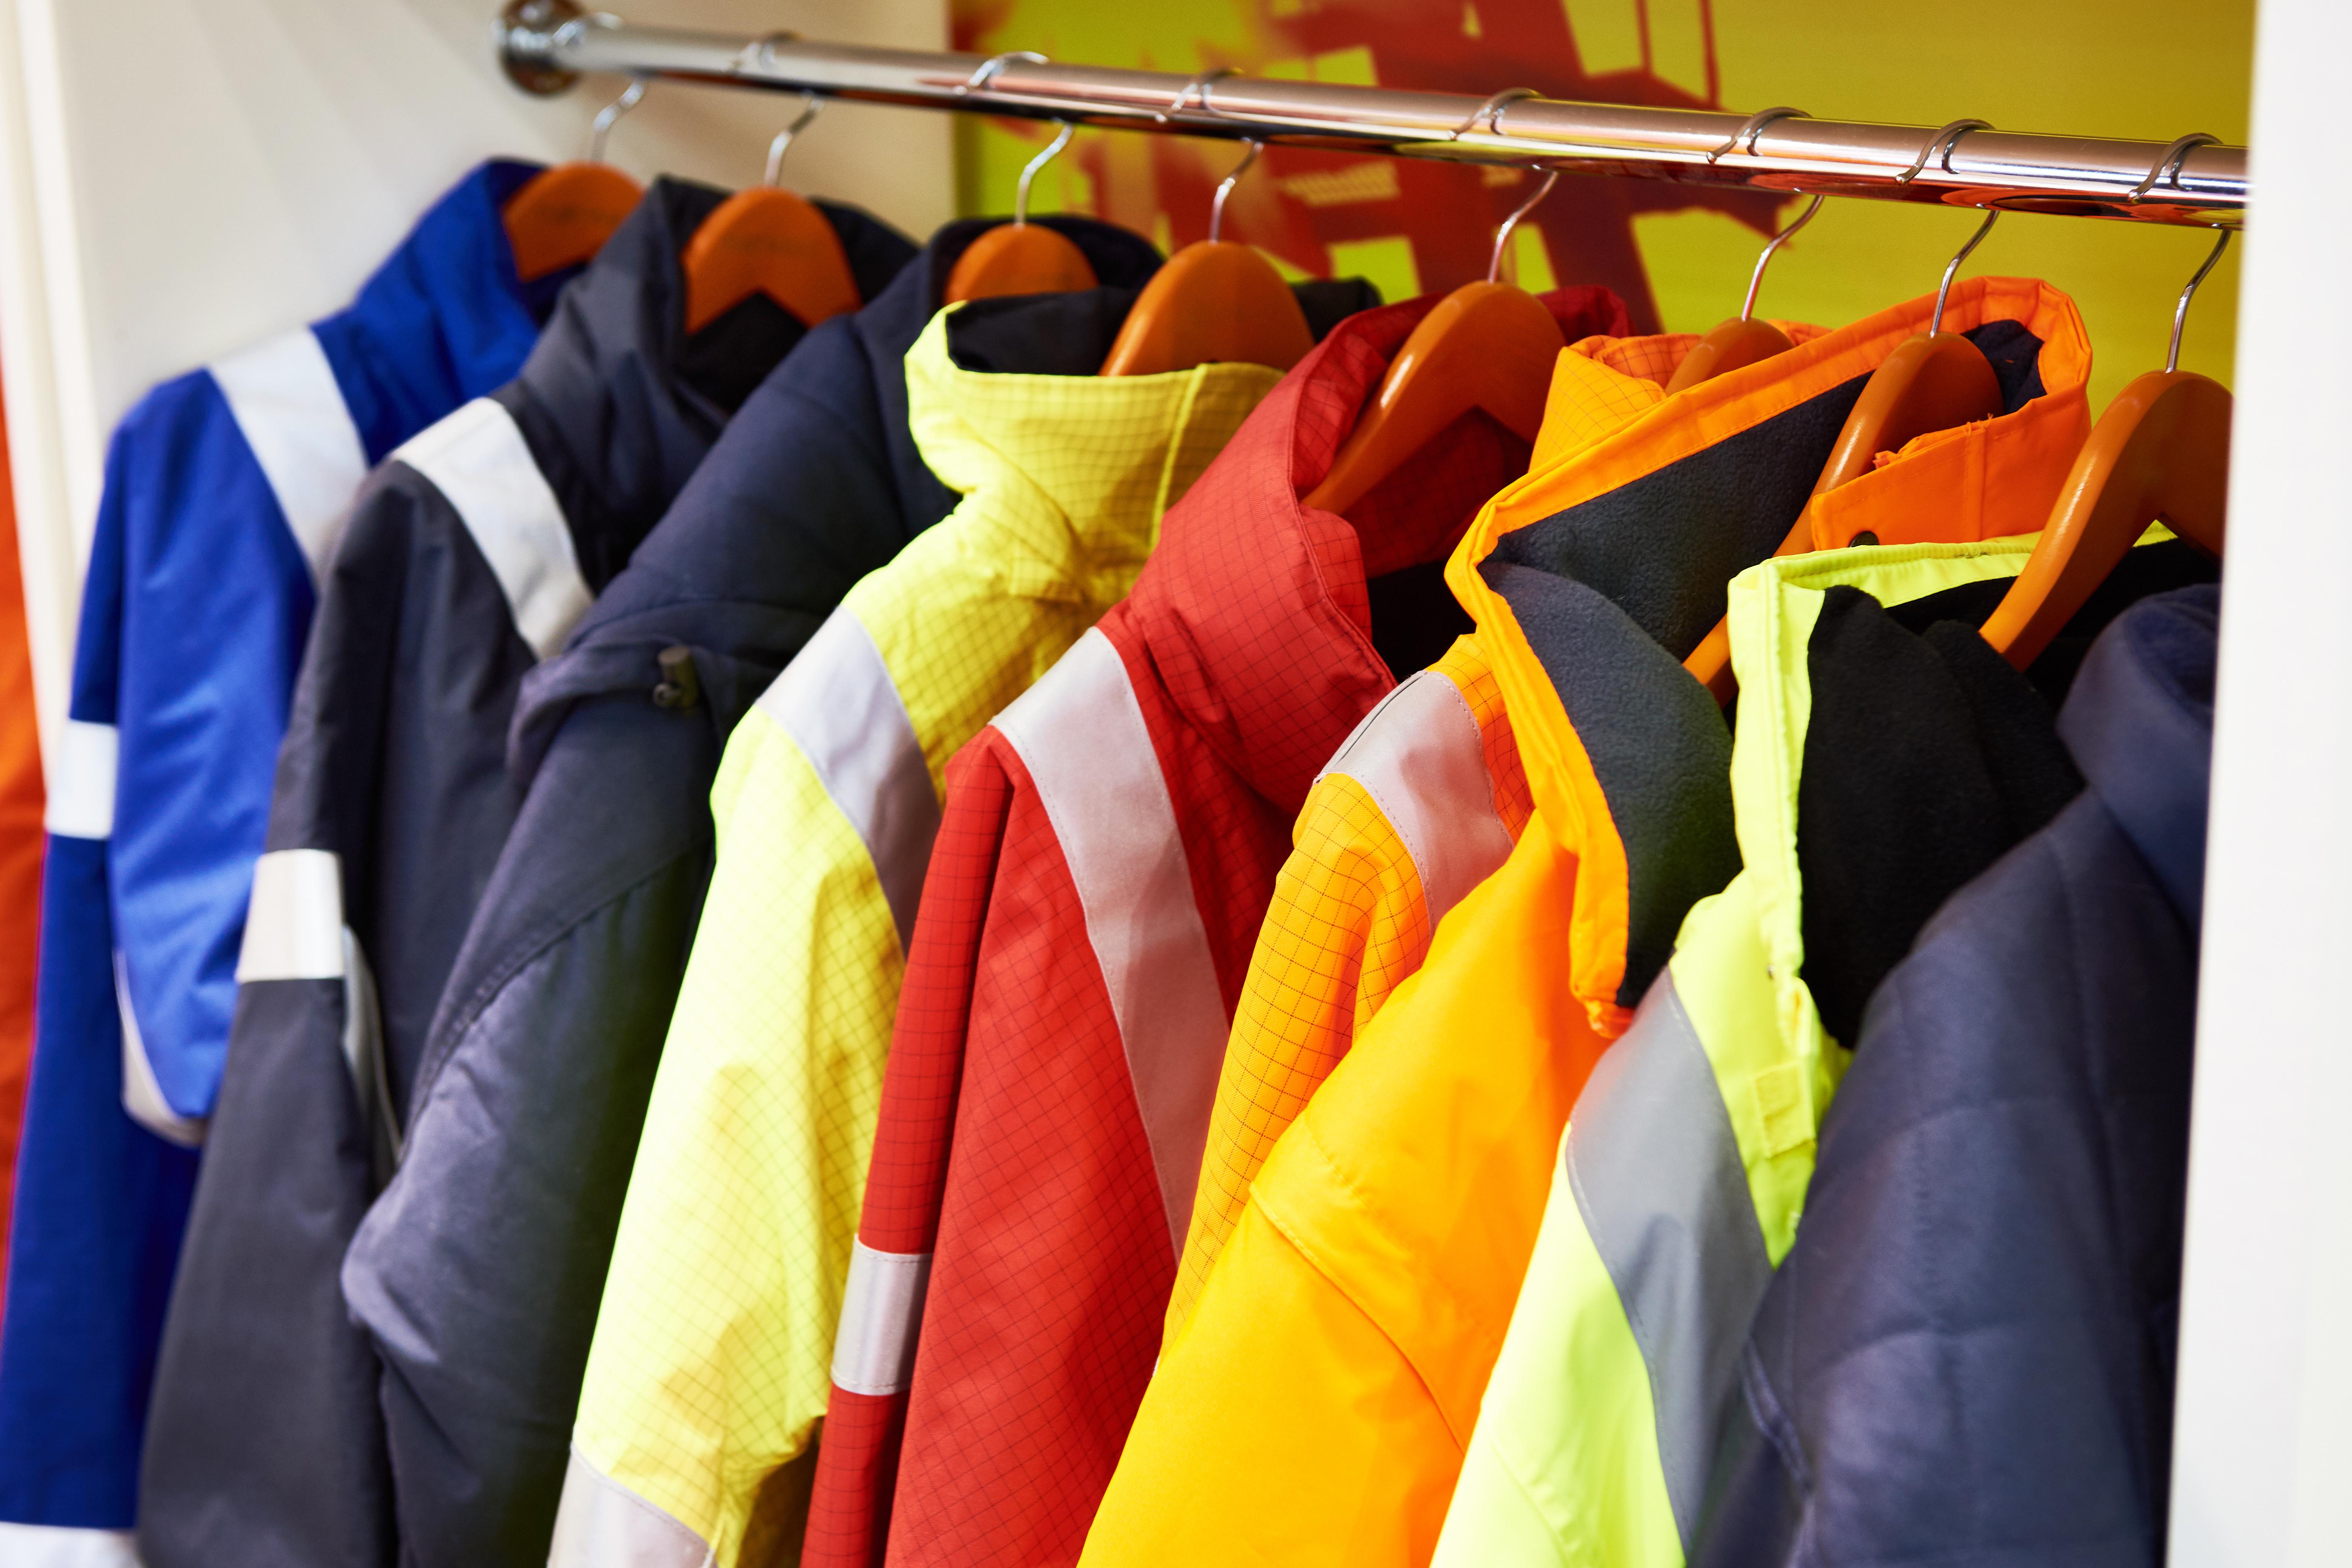 TMA Workwear: A Family Run Business